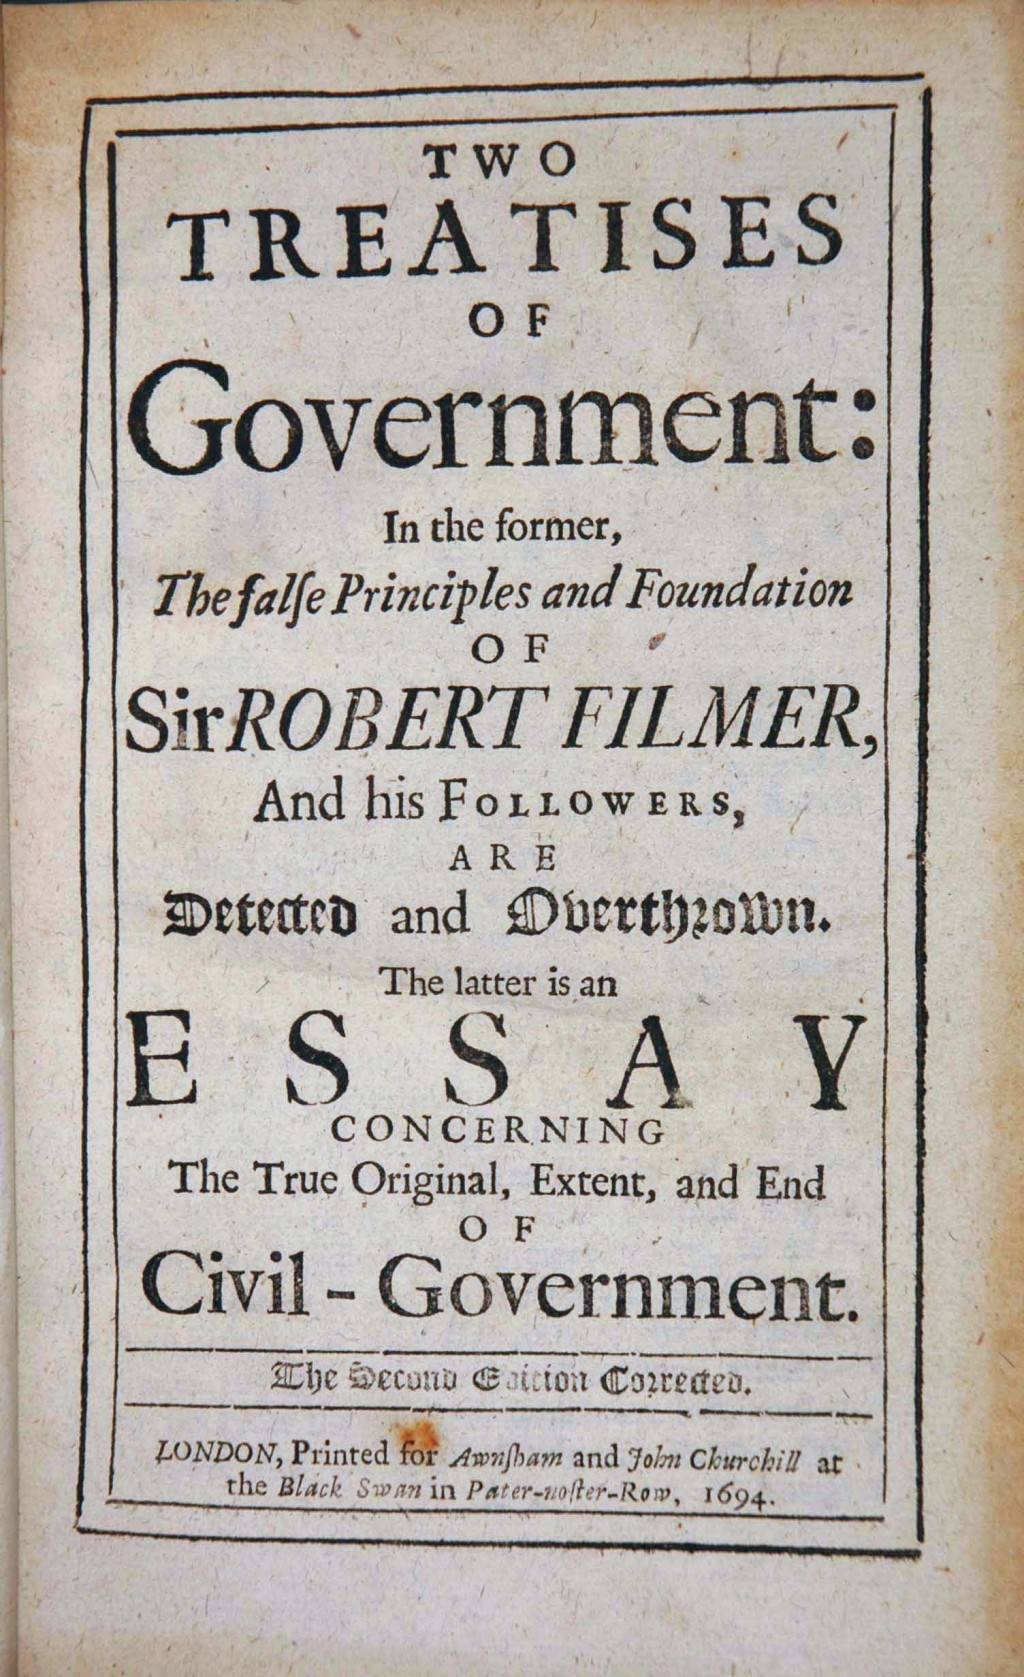 006 John Locke Essay Two Treatise Impressive Concerning Human Understanding Book 4 On Pdf Summary Large